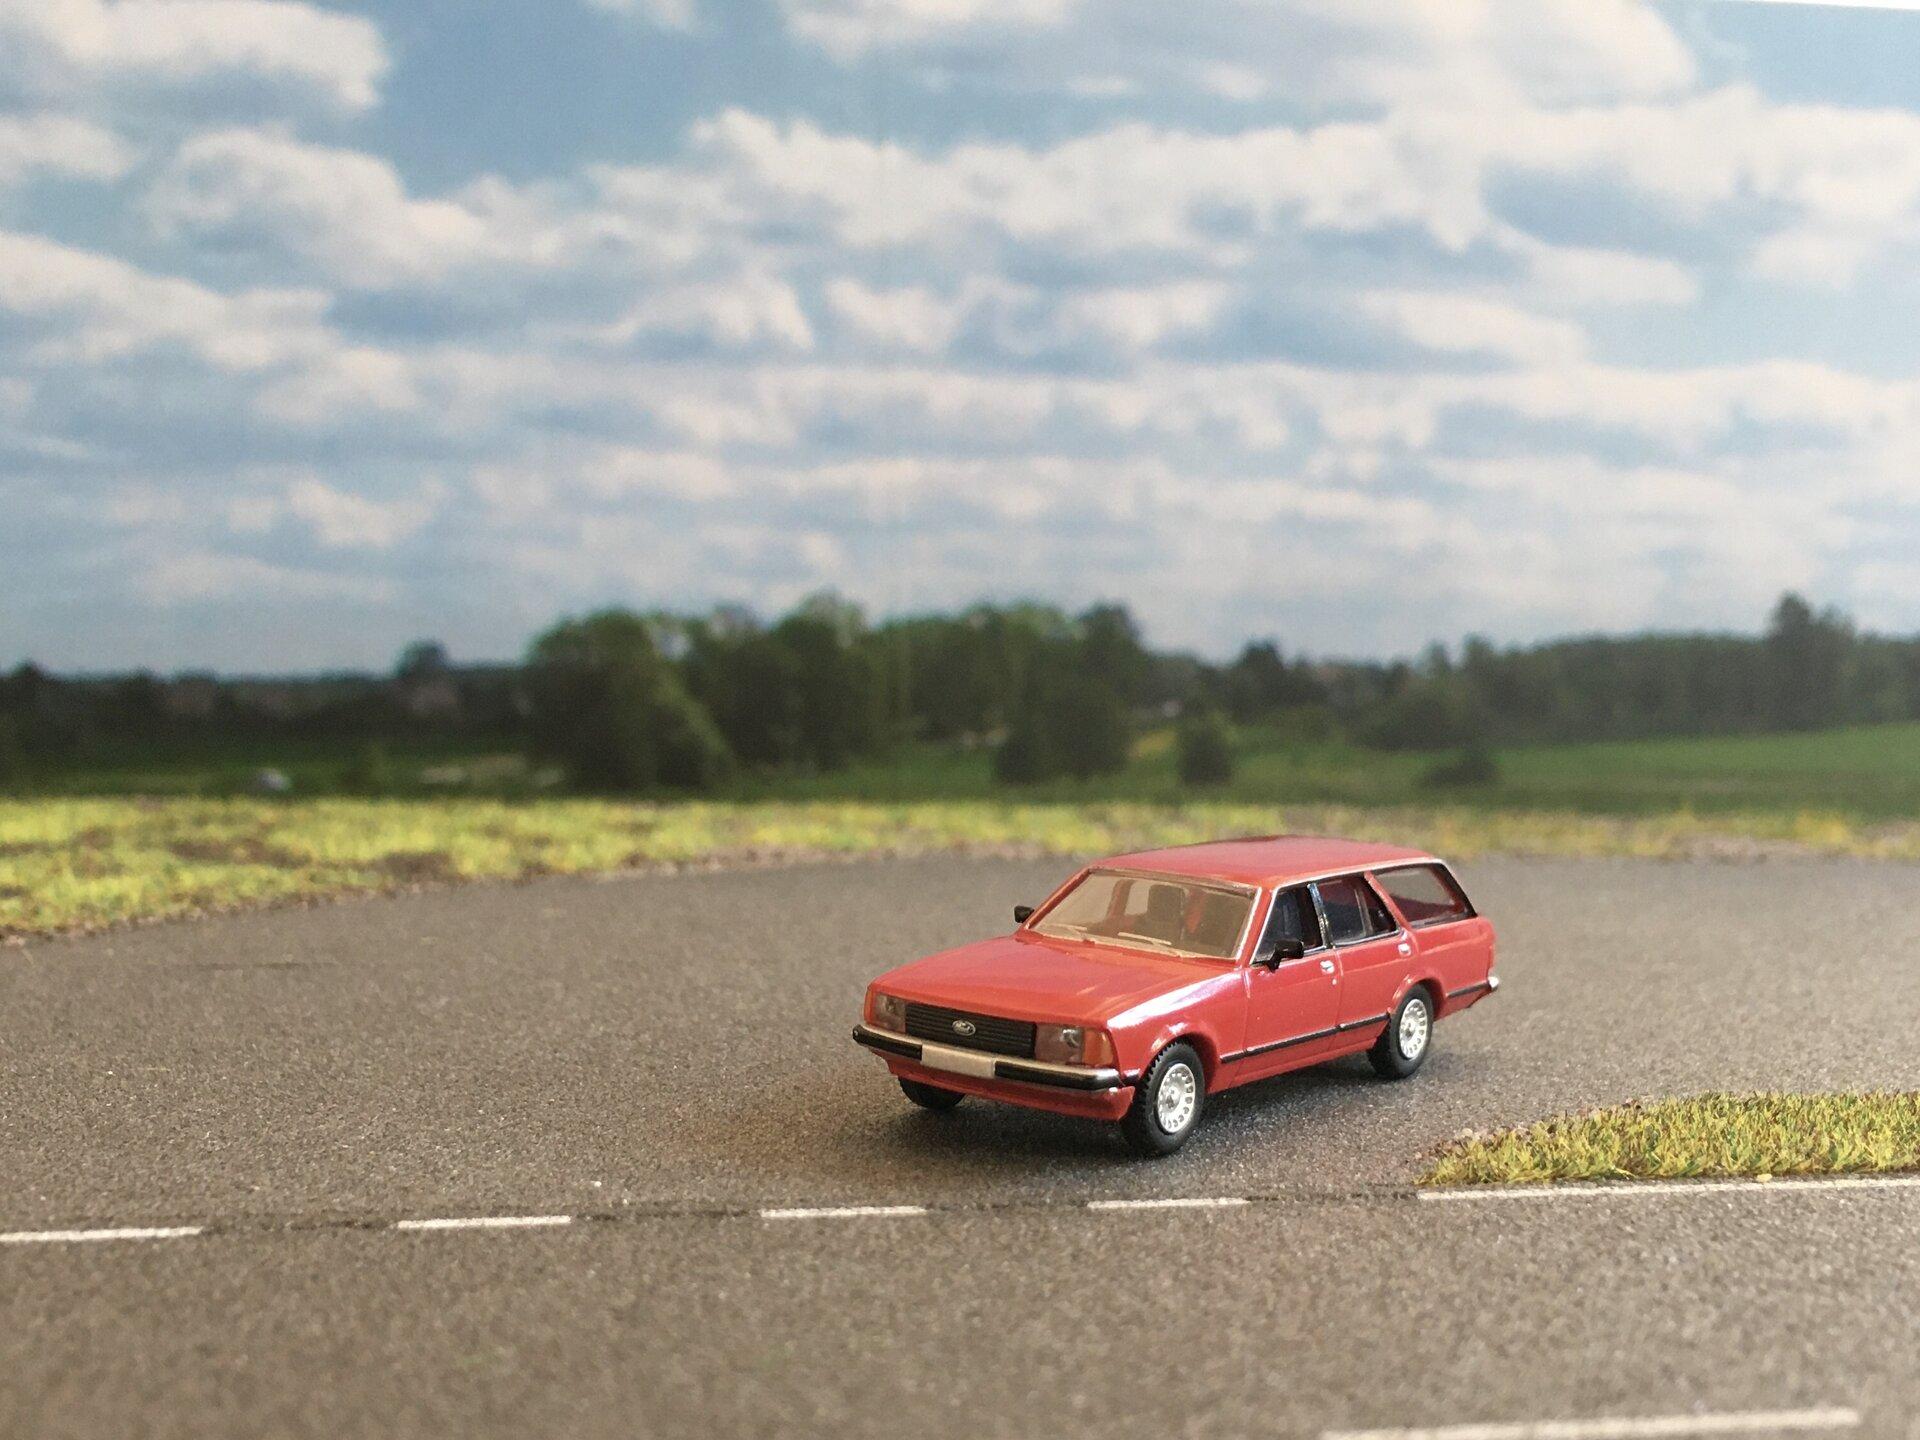 Ford Granada 002.jpg